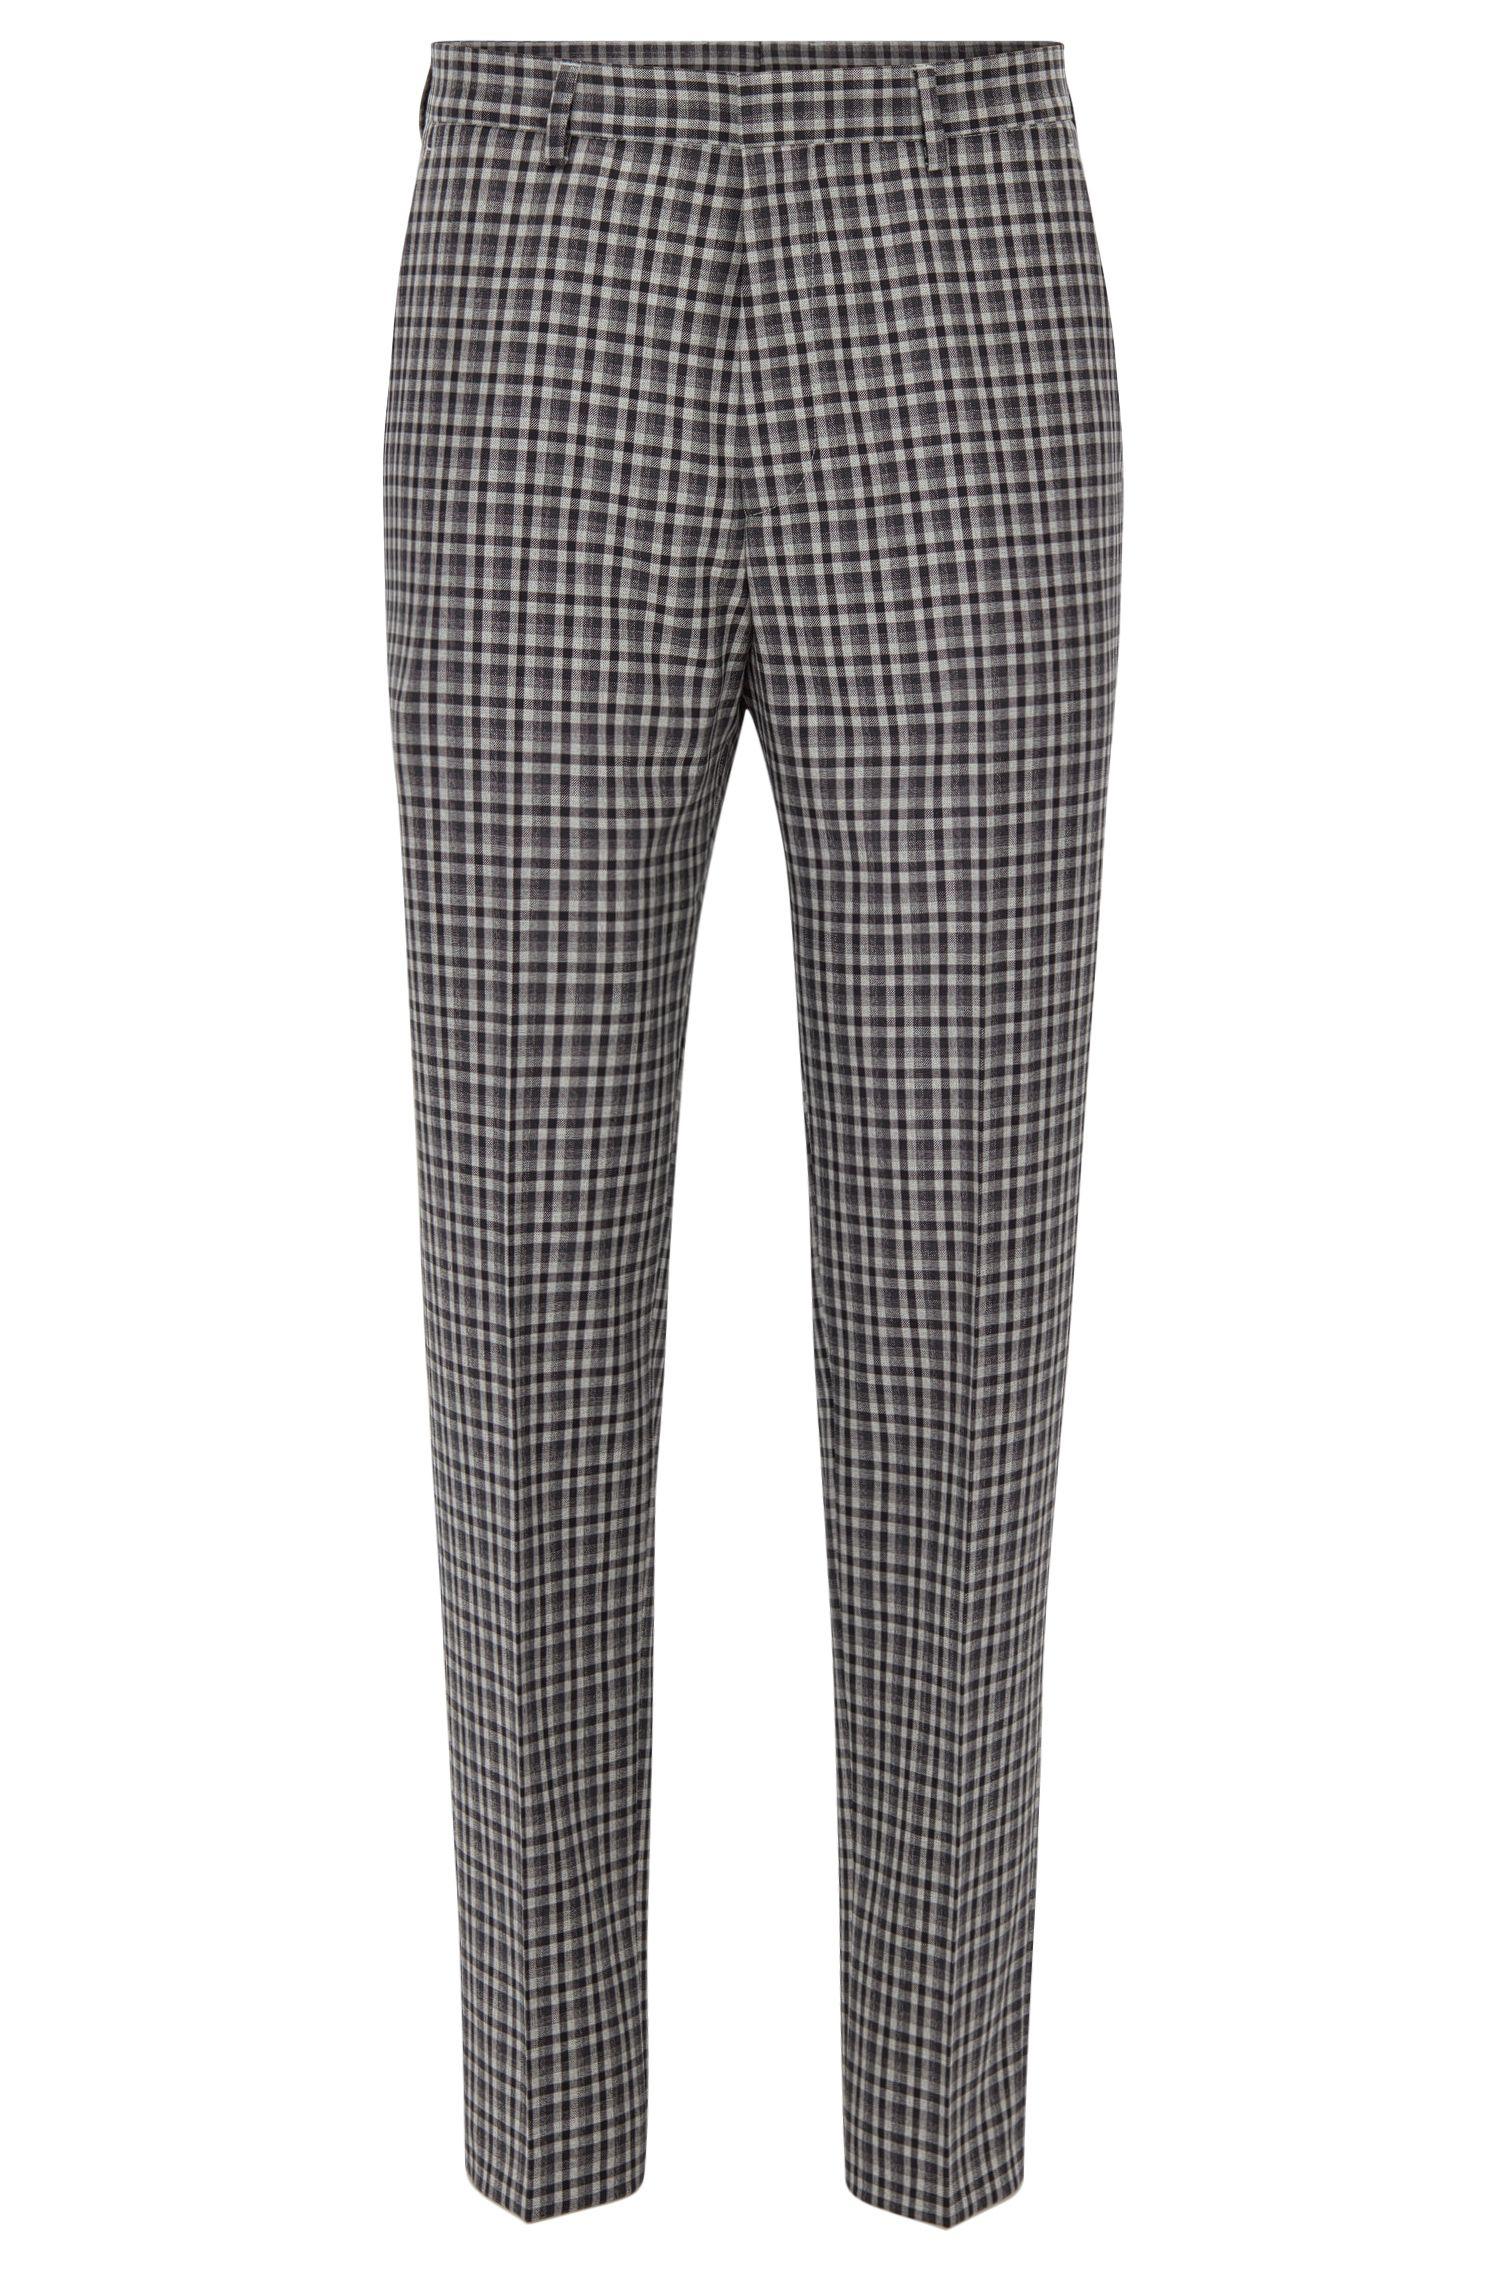 Checked Wool Dress Pant, Slim Fit | Pirko, Grey